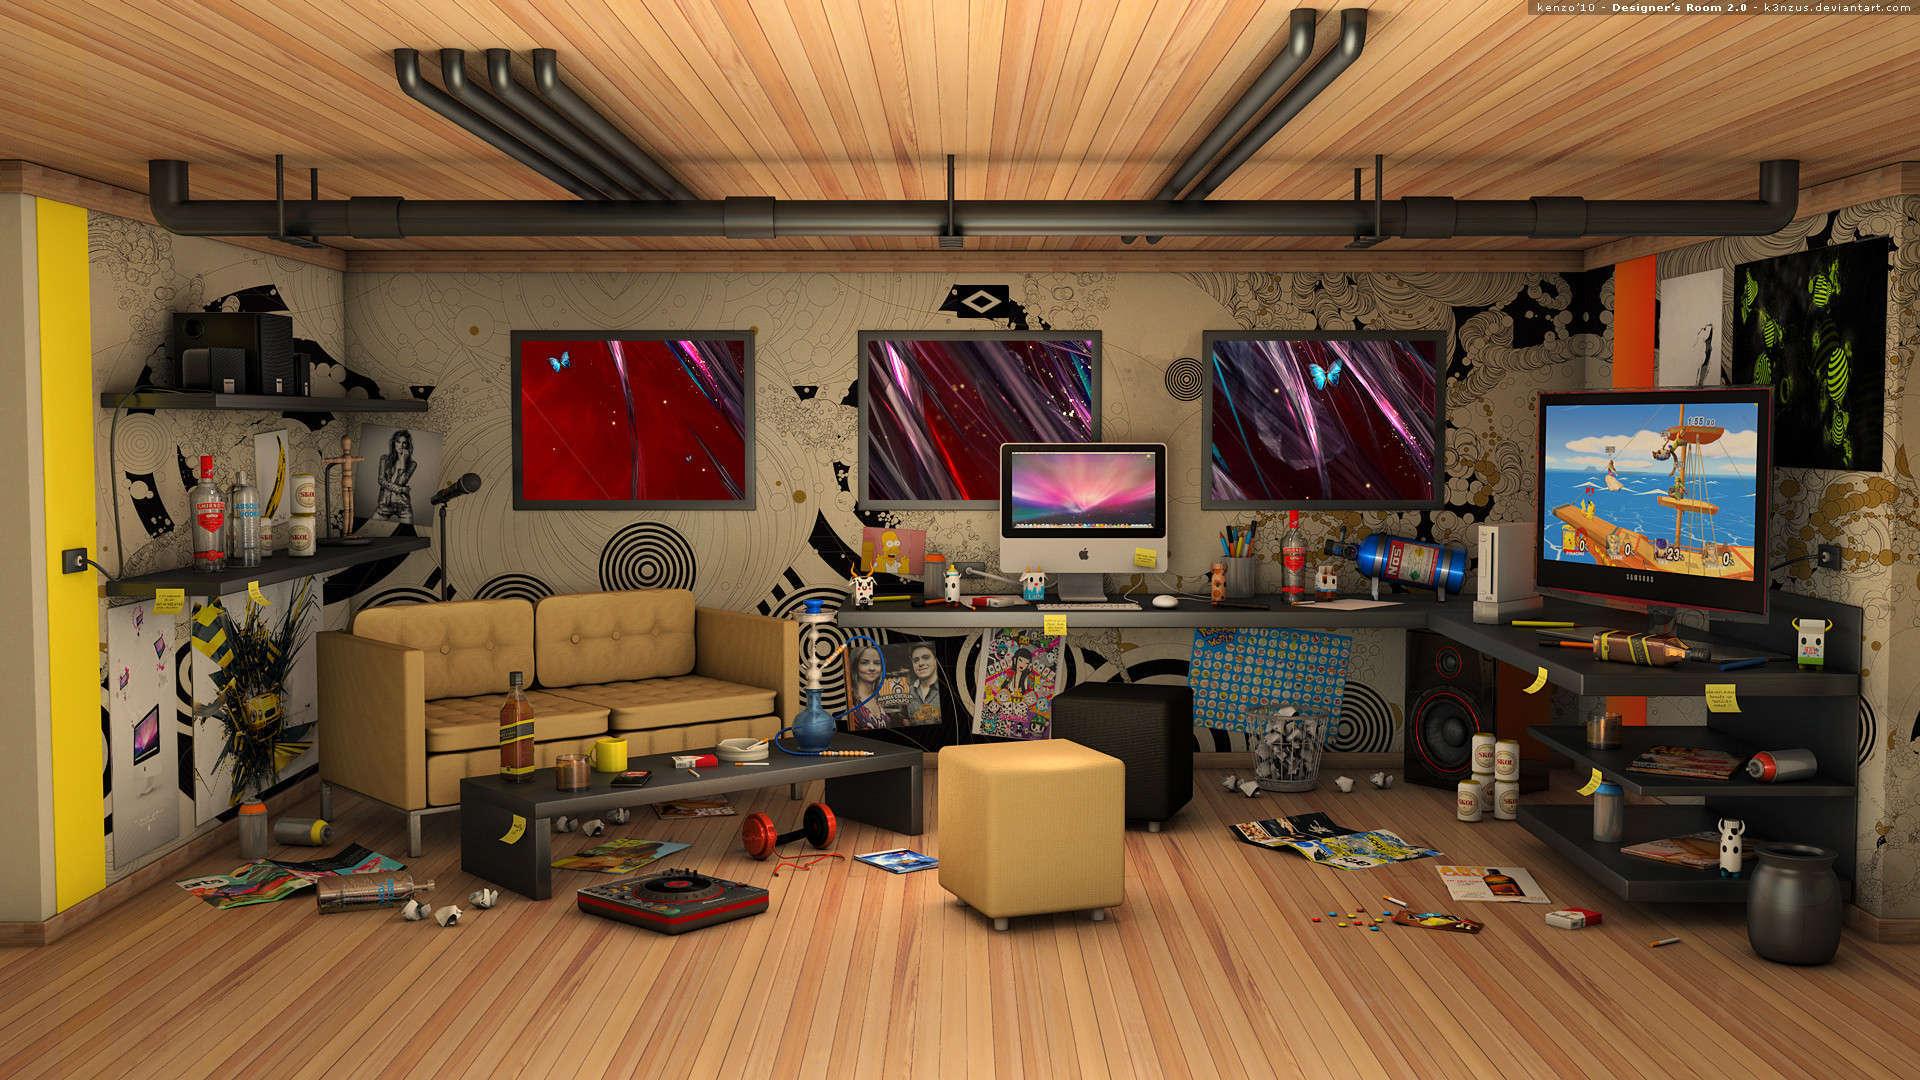 Hd-PC-Room-1080p-wallpaper-wp3606710